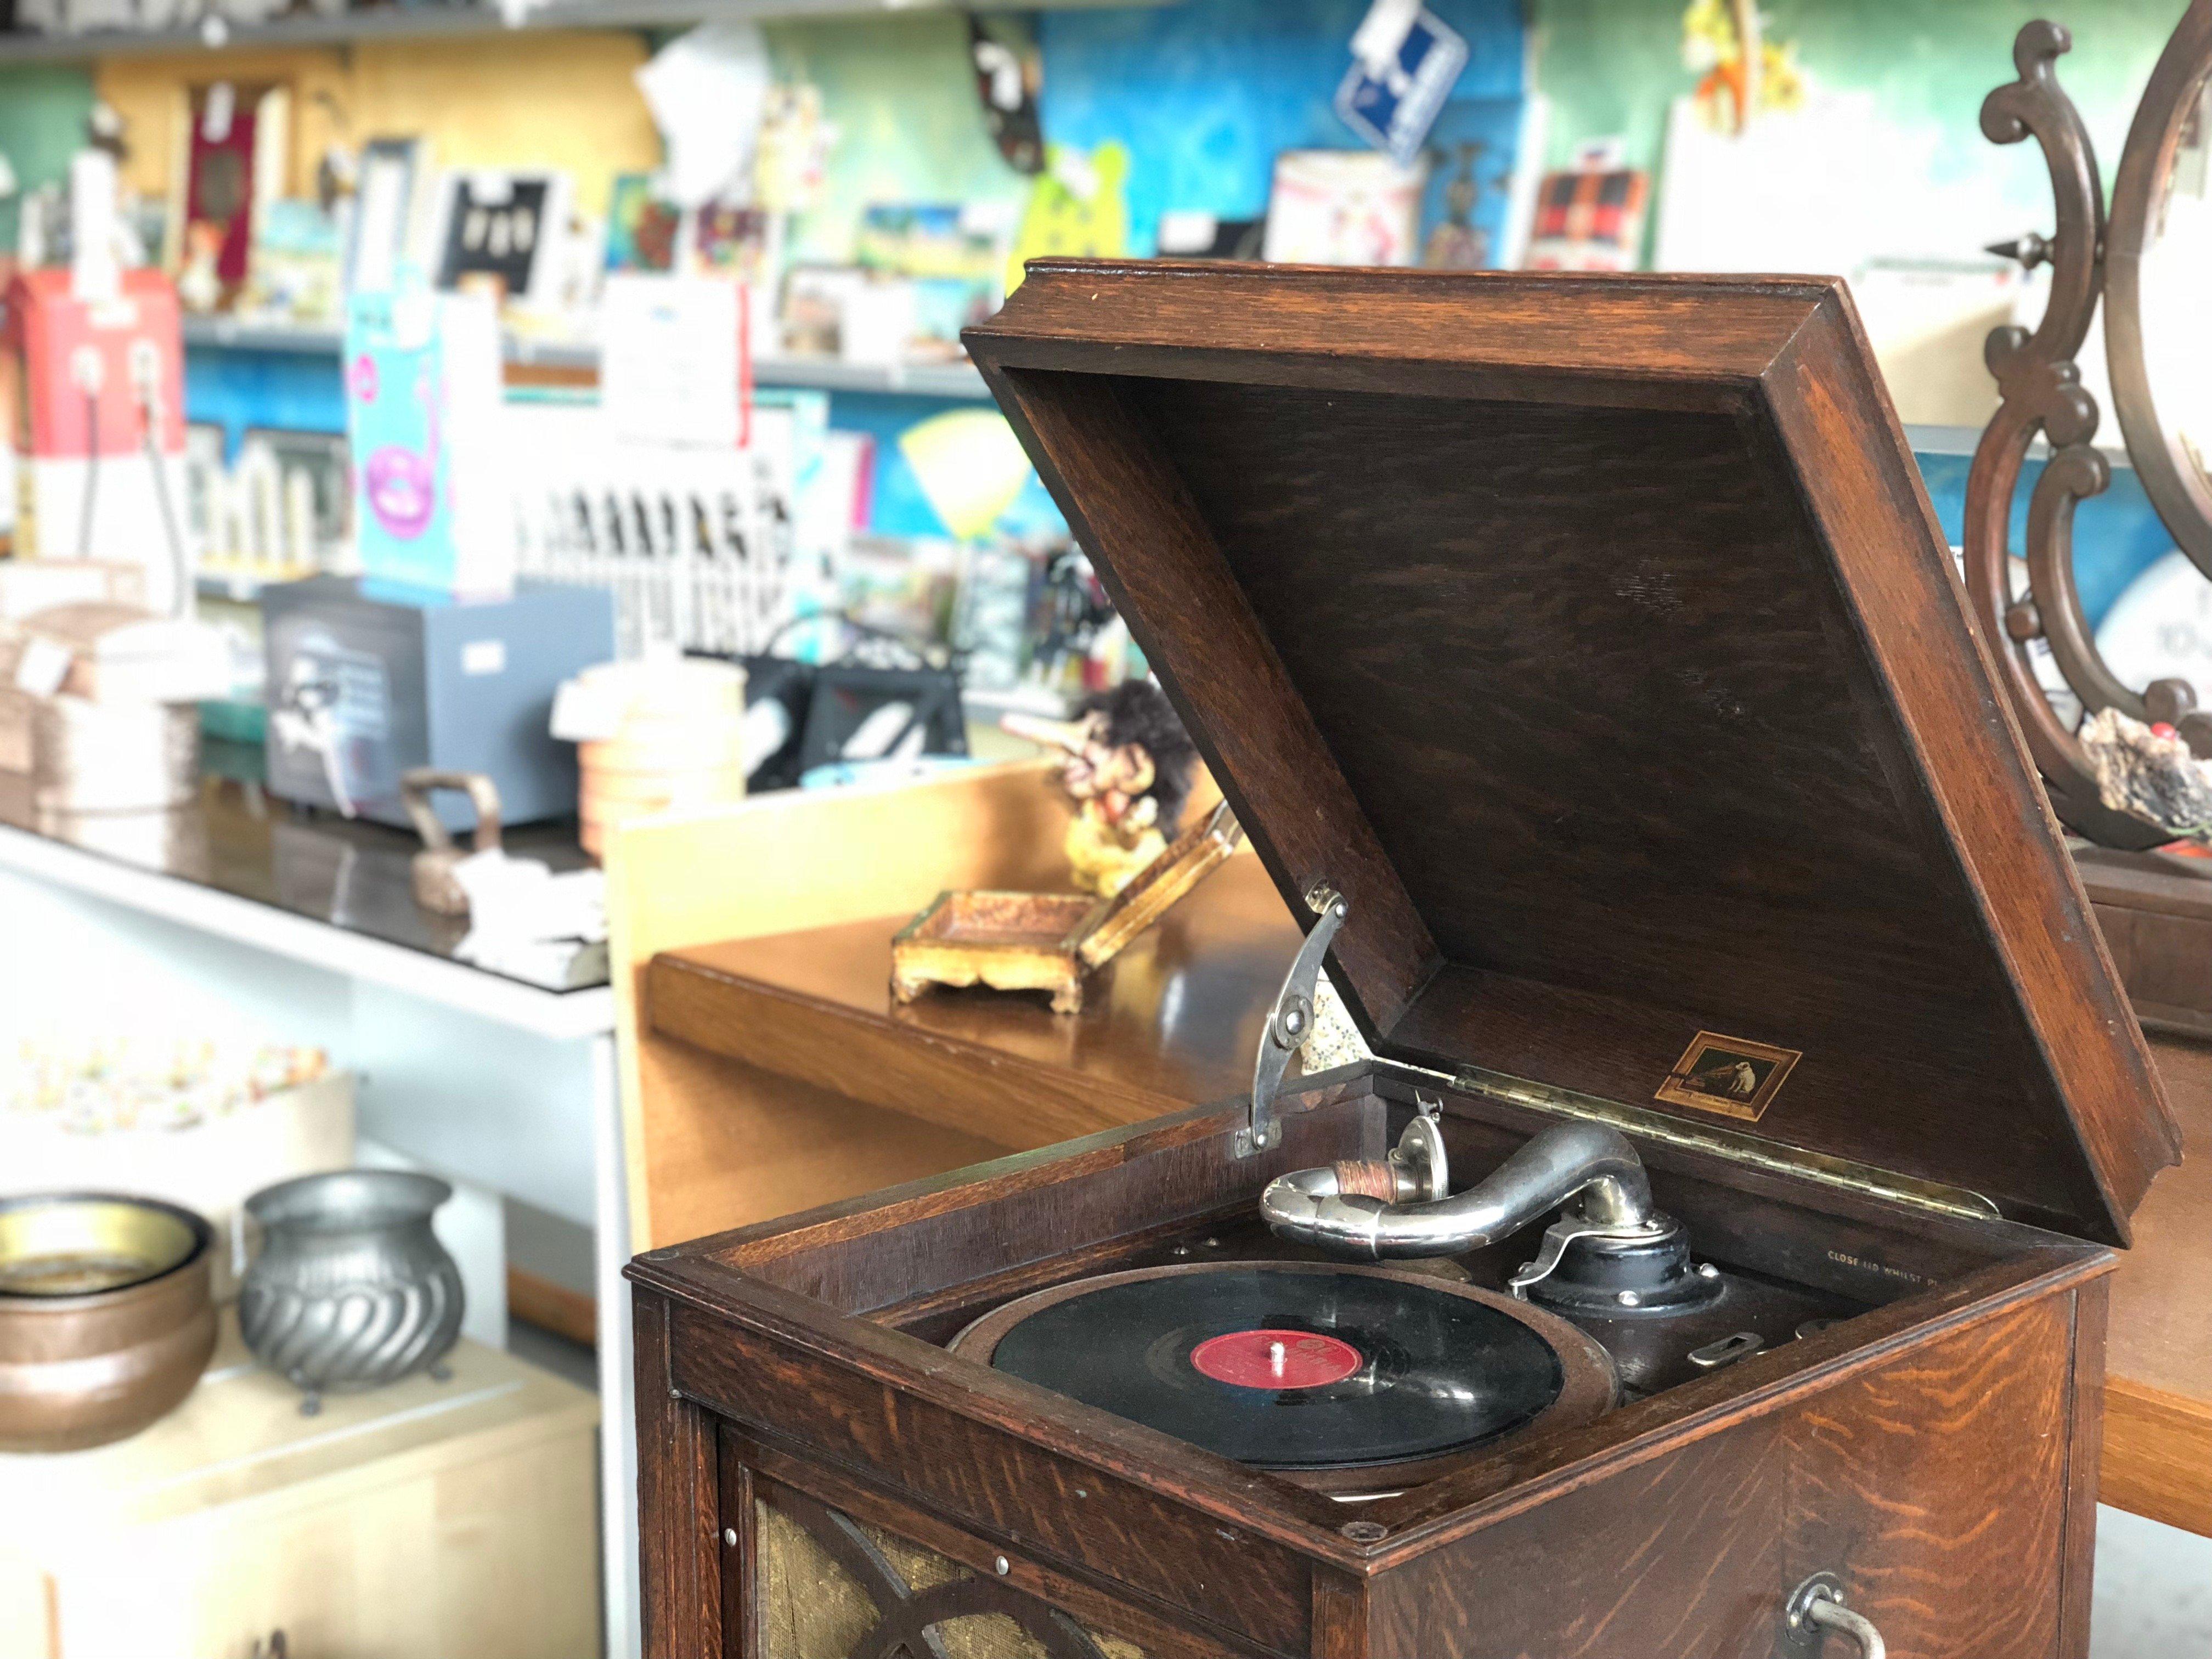 riuso grammofono mercatopoli